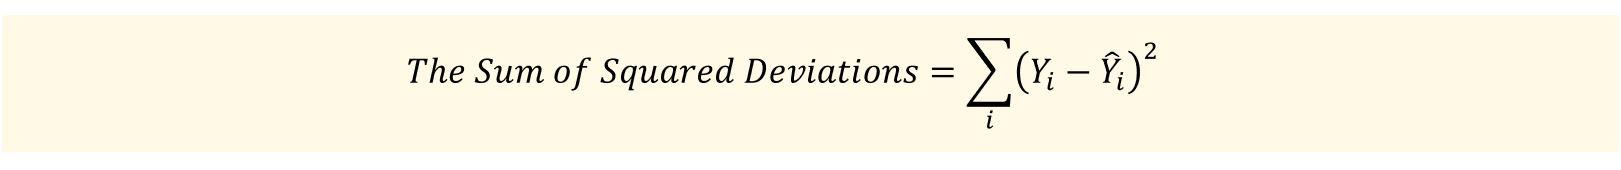 𝑇ℎ𝑒 𝑆𝑢𝑚 𝑜𝑓 𝑆𝑞𝑢𝑎𝑟𝑒𝑑 𝐷𝑒𝑣𝑖𝑎𝑡𝑖𝑜𝑛𝑠=∑_𝑖▒(𝑌_𝑖−𝑌̂_𝑖 )^2